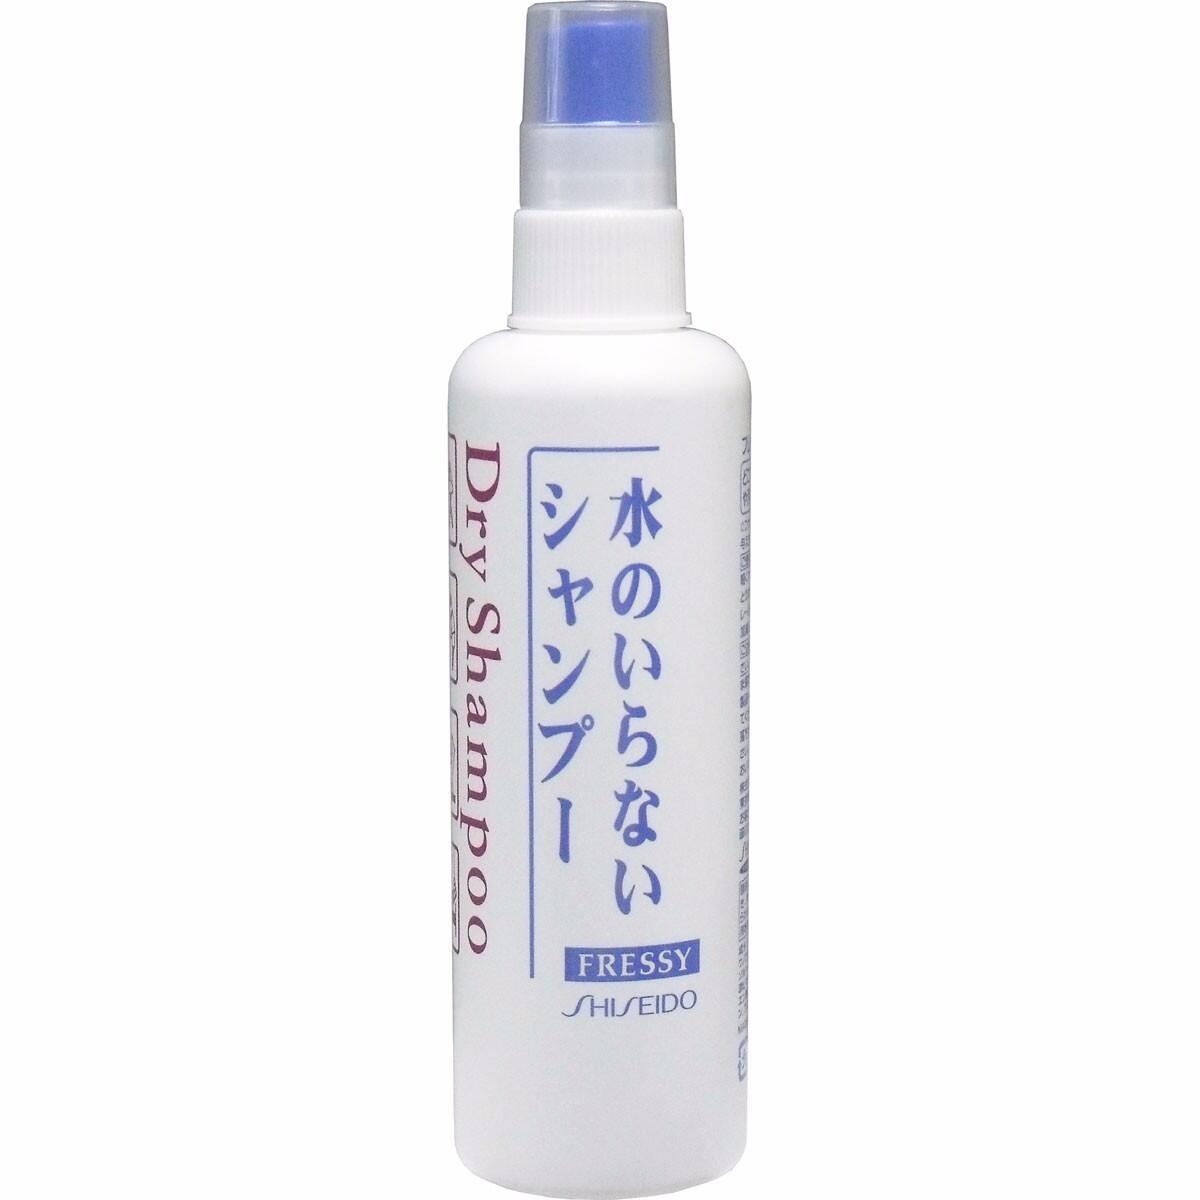 Dầu gội khô Shiseido Dry Shampoo 150ml